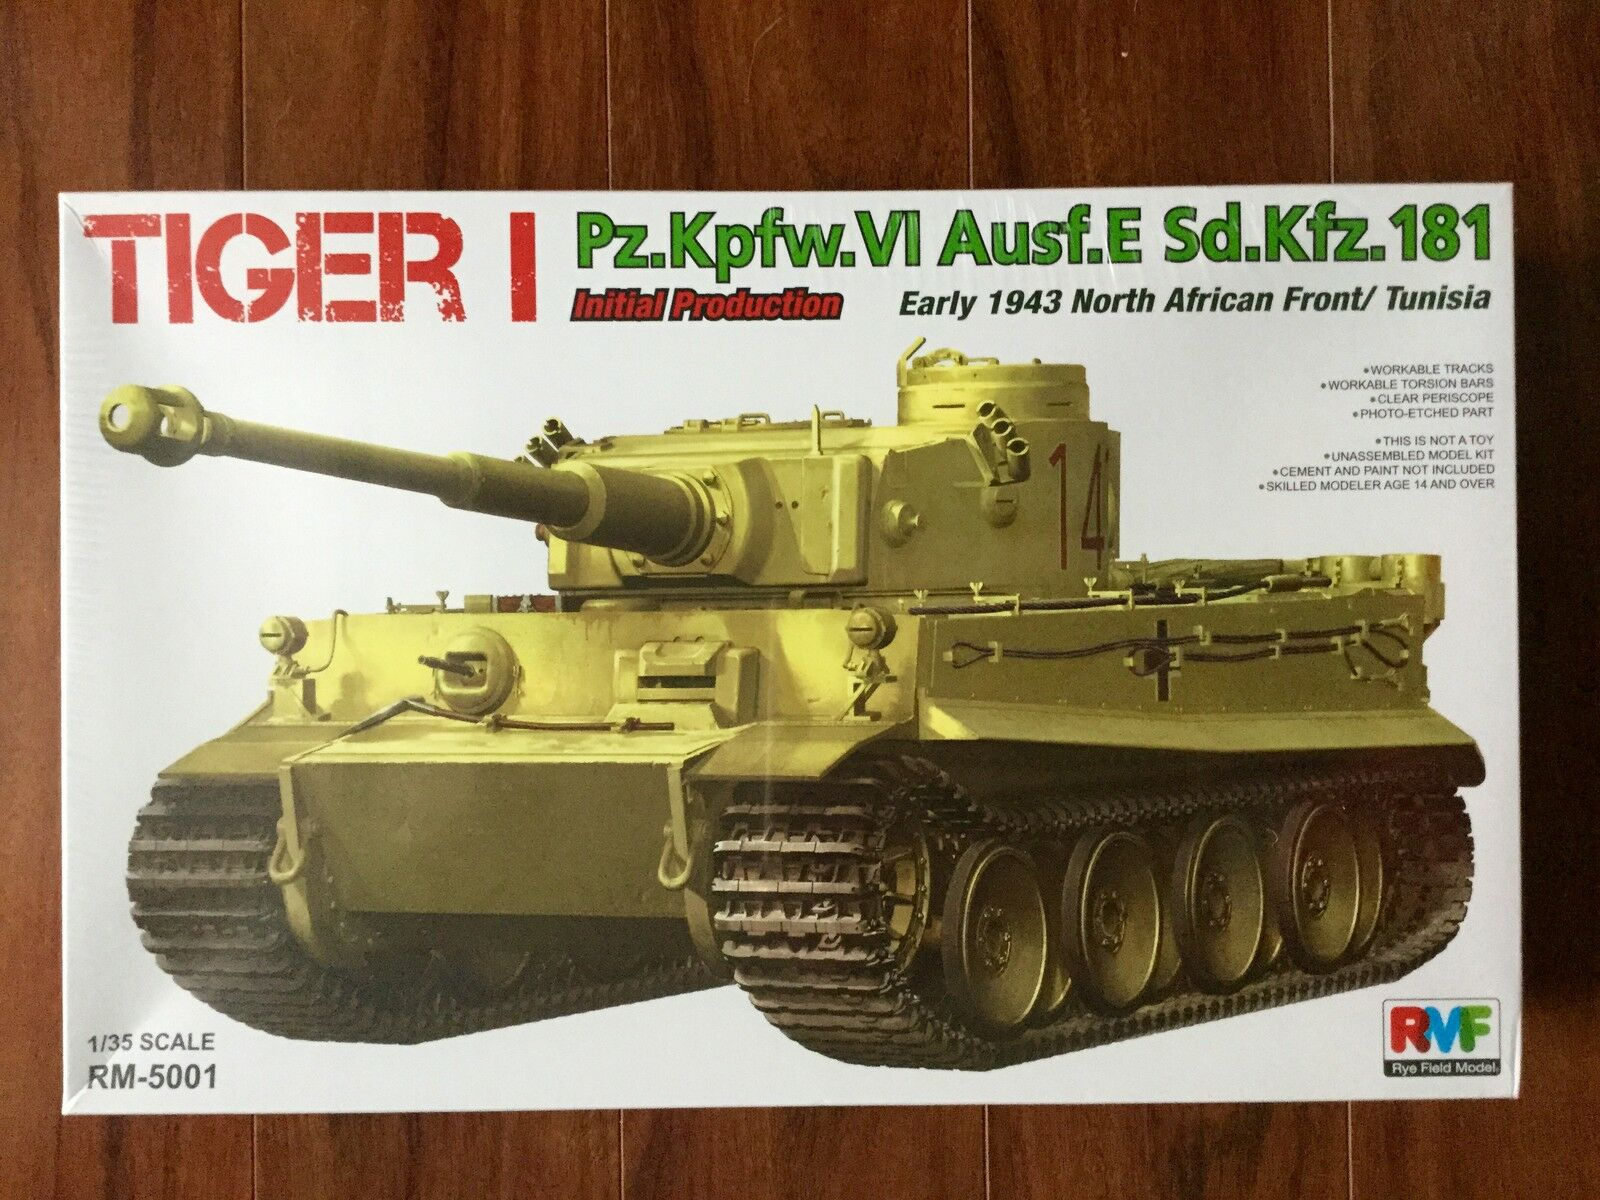 RYE FIELD modellllerL 1  35 WW II TYRMAN TIGER AUSF.E SD.KFZ.181 NORDAFRICA 501 F  S